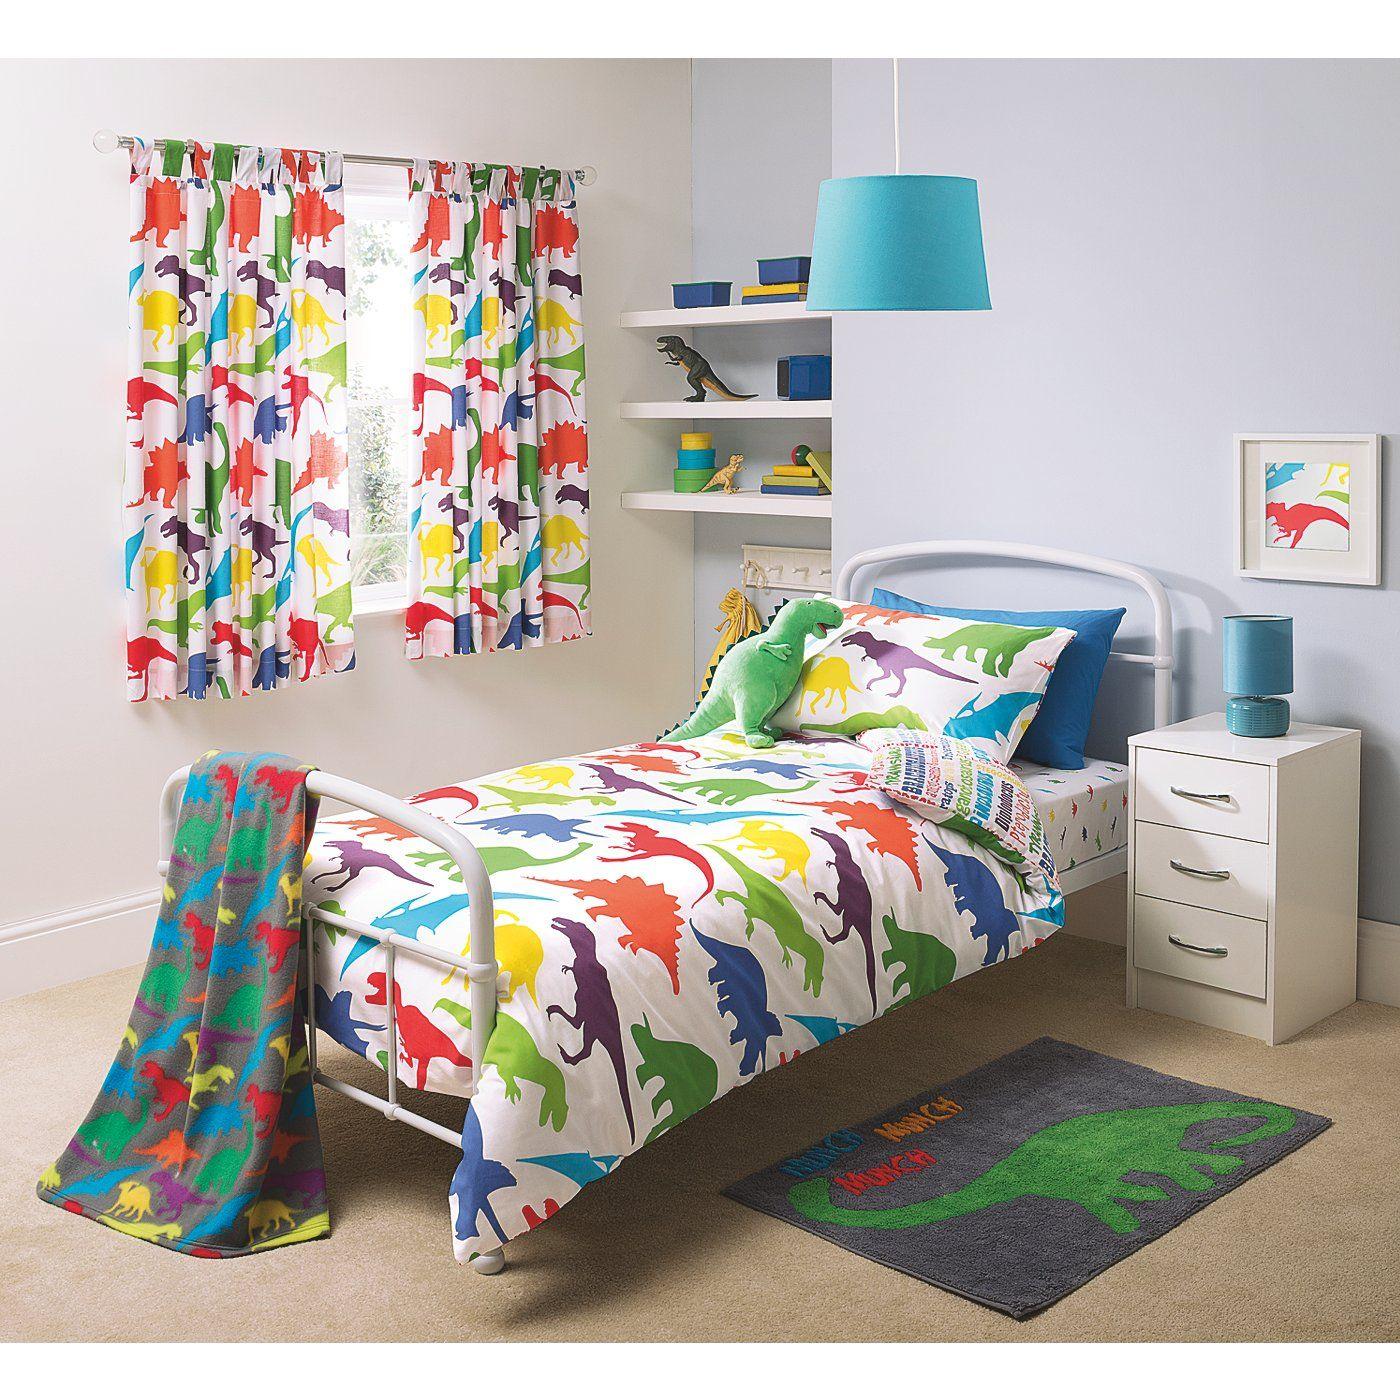 Asda Kids Bedroom Www Stkittsvilla Com